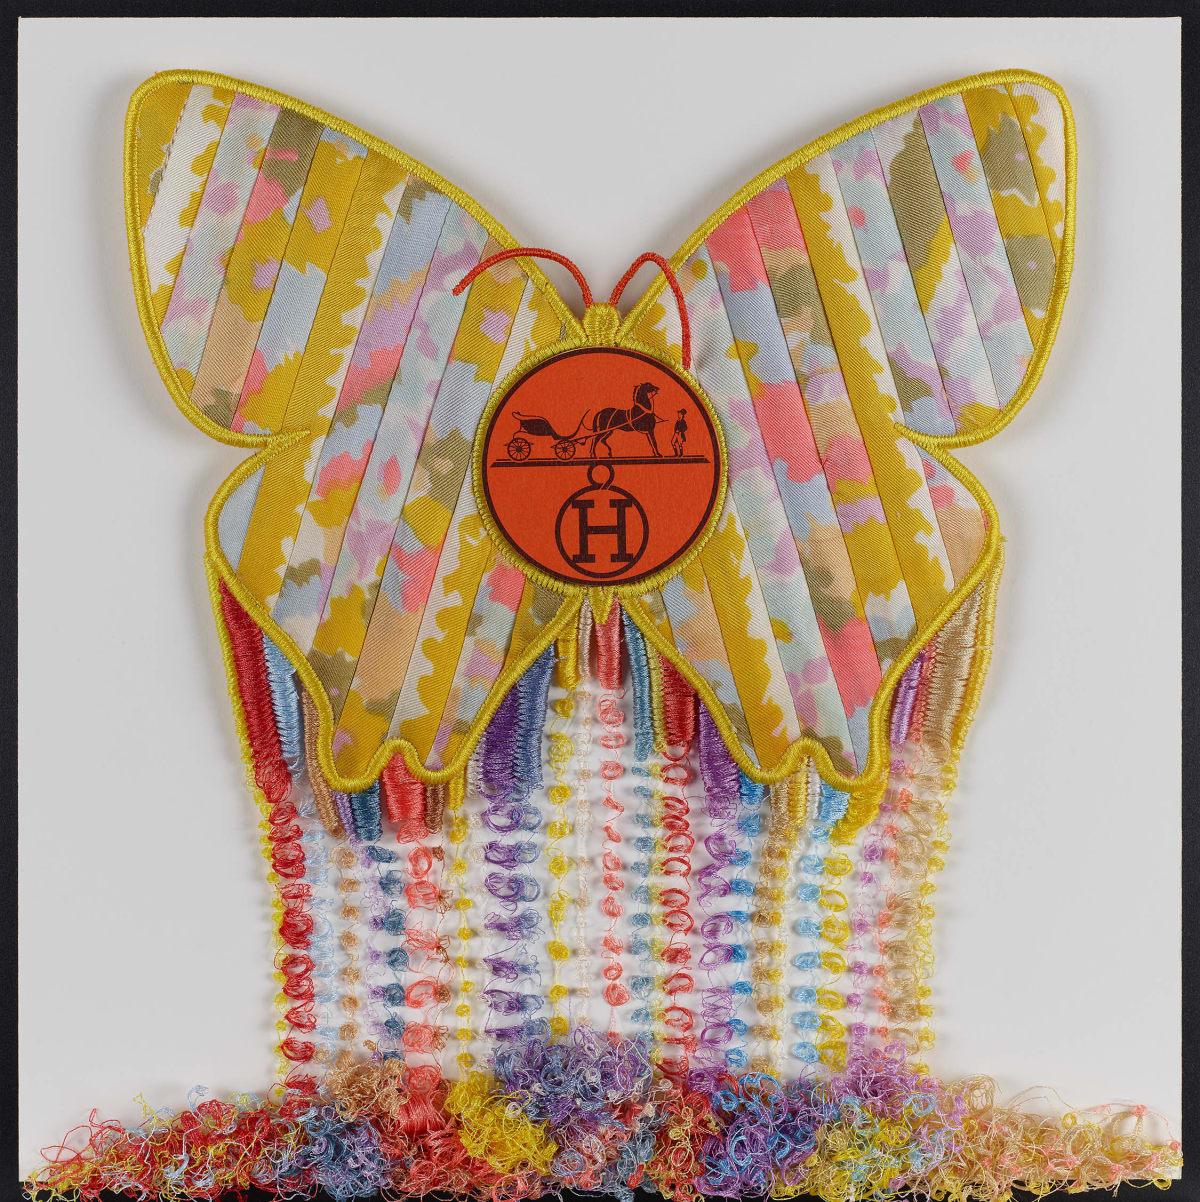 Stephen Wilson, Hermes Butterfly Drip, 2019